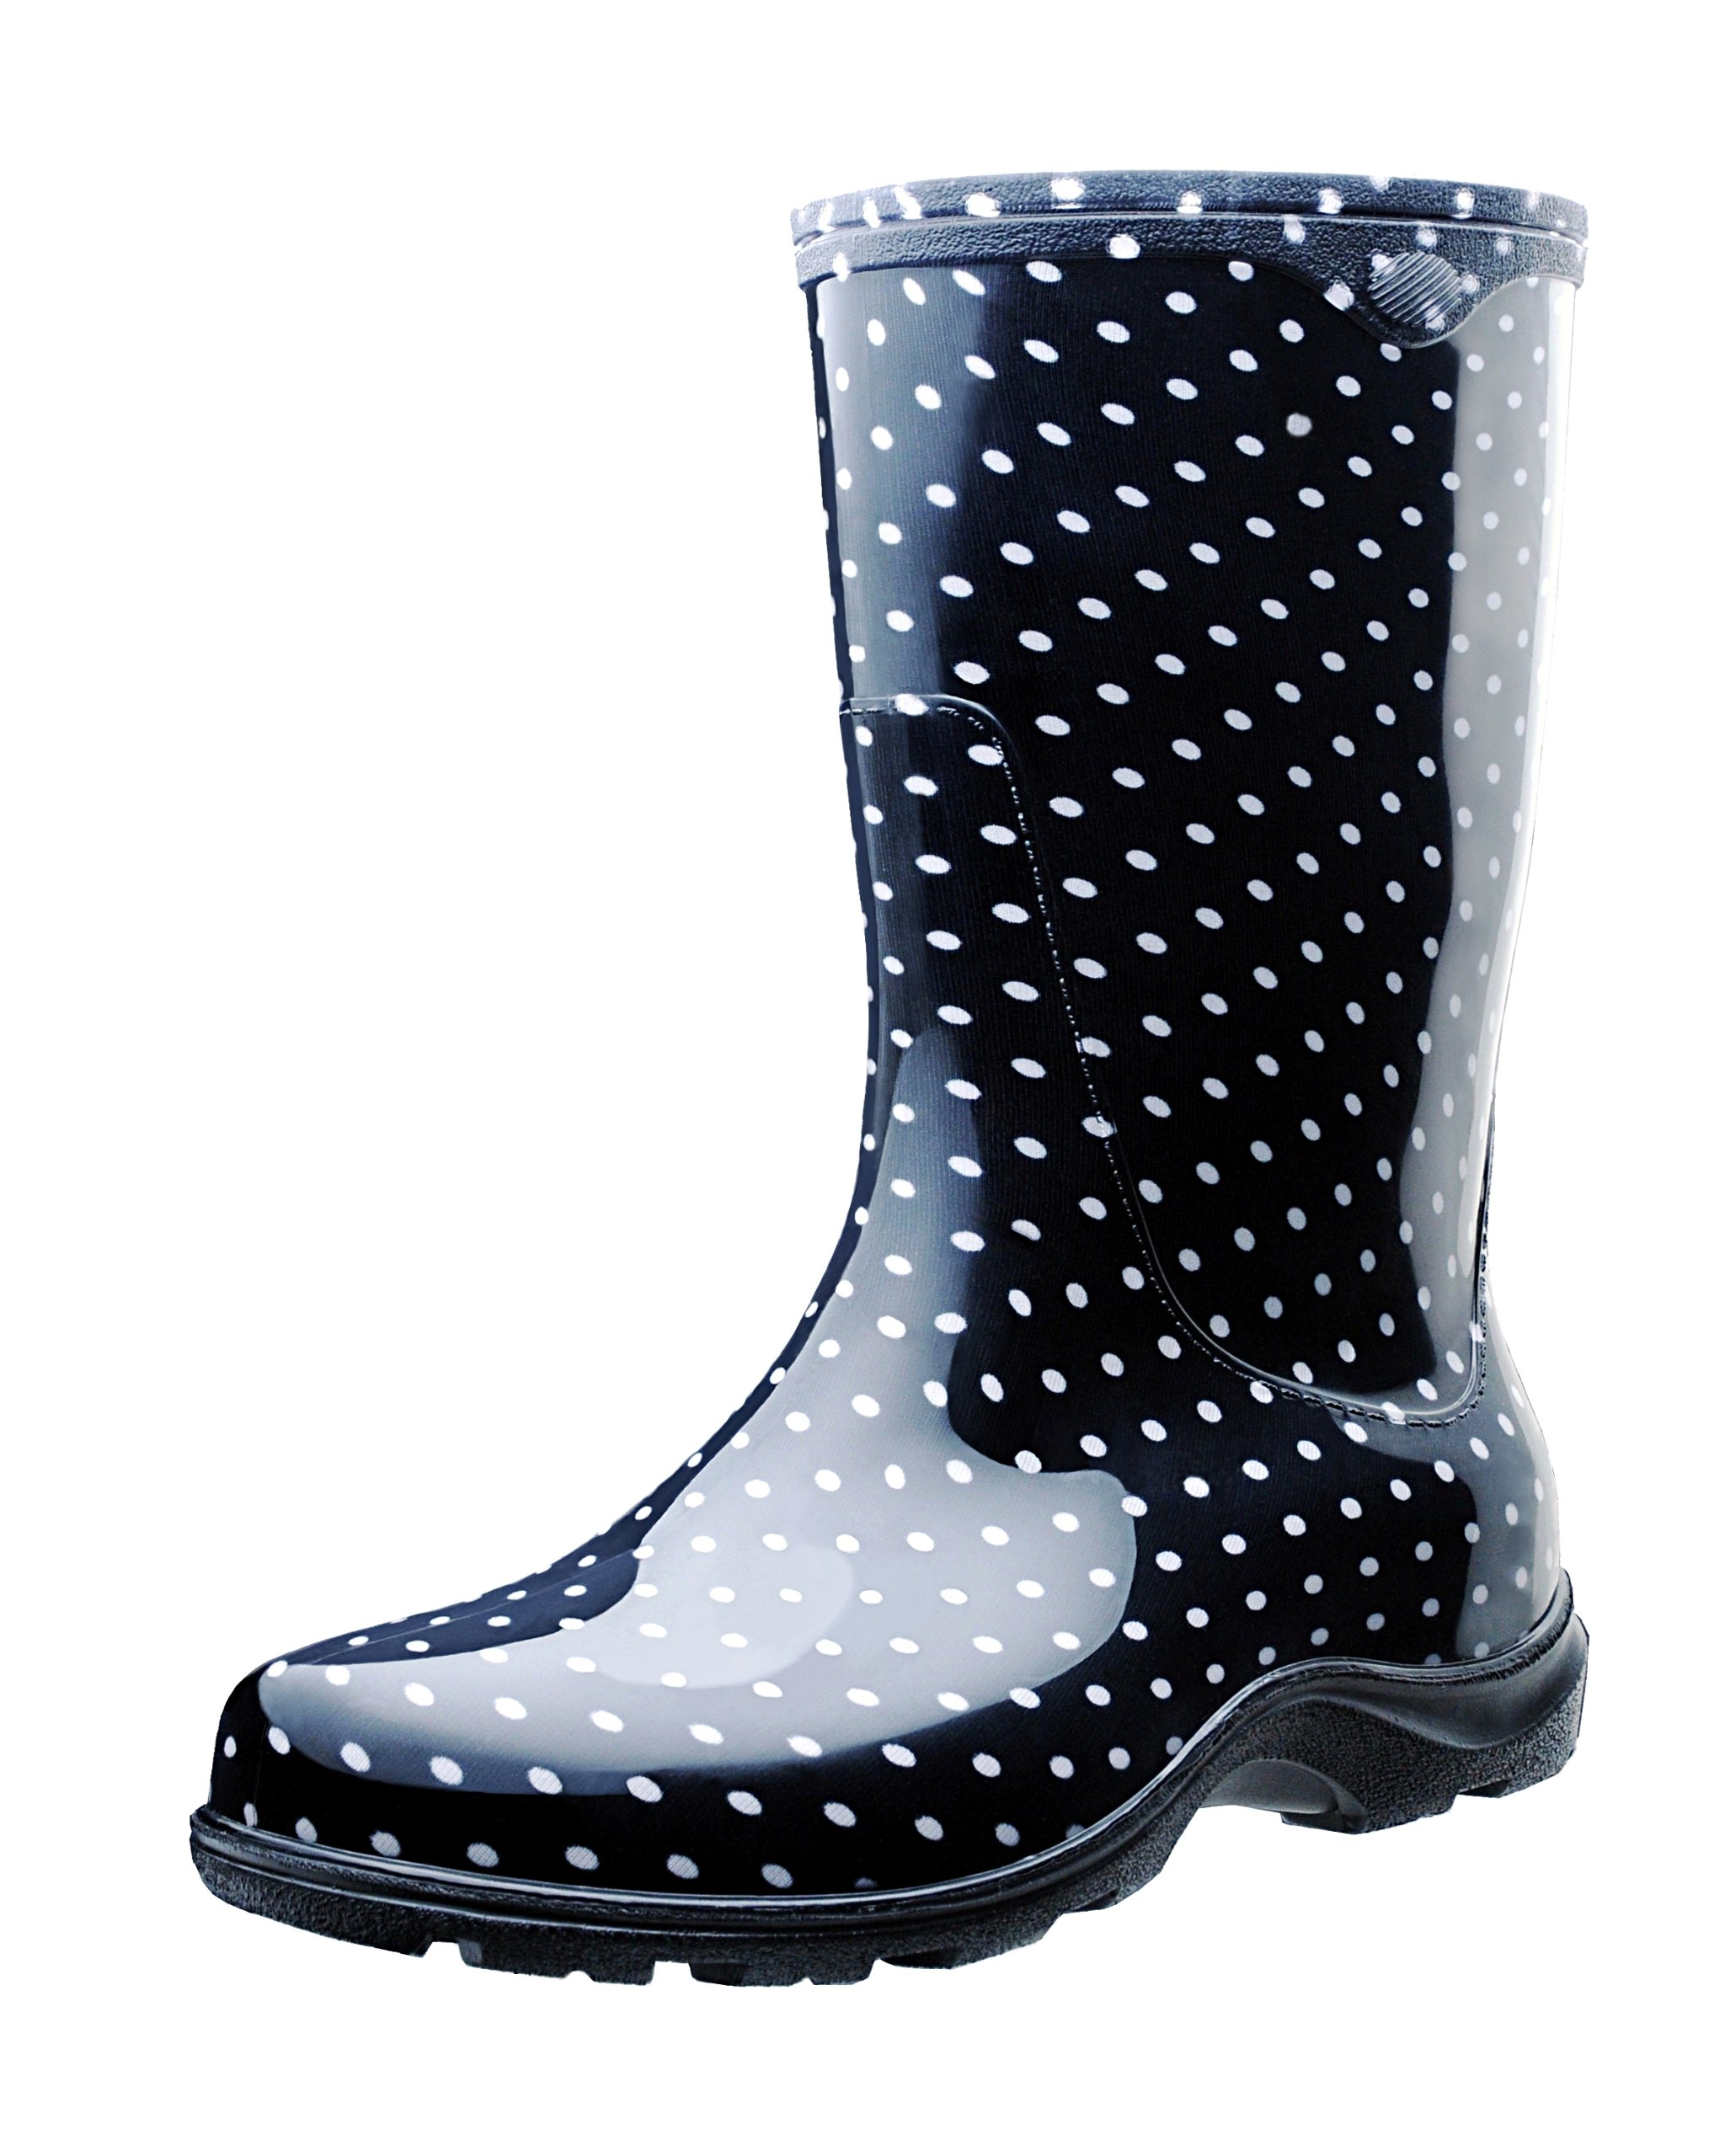 Sloggers Womens Waterproof Comfort 5013BP09